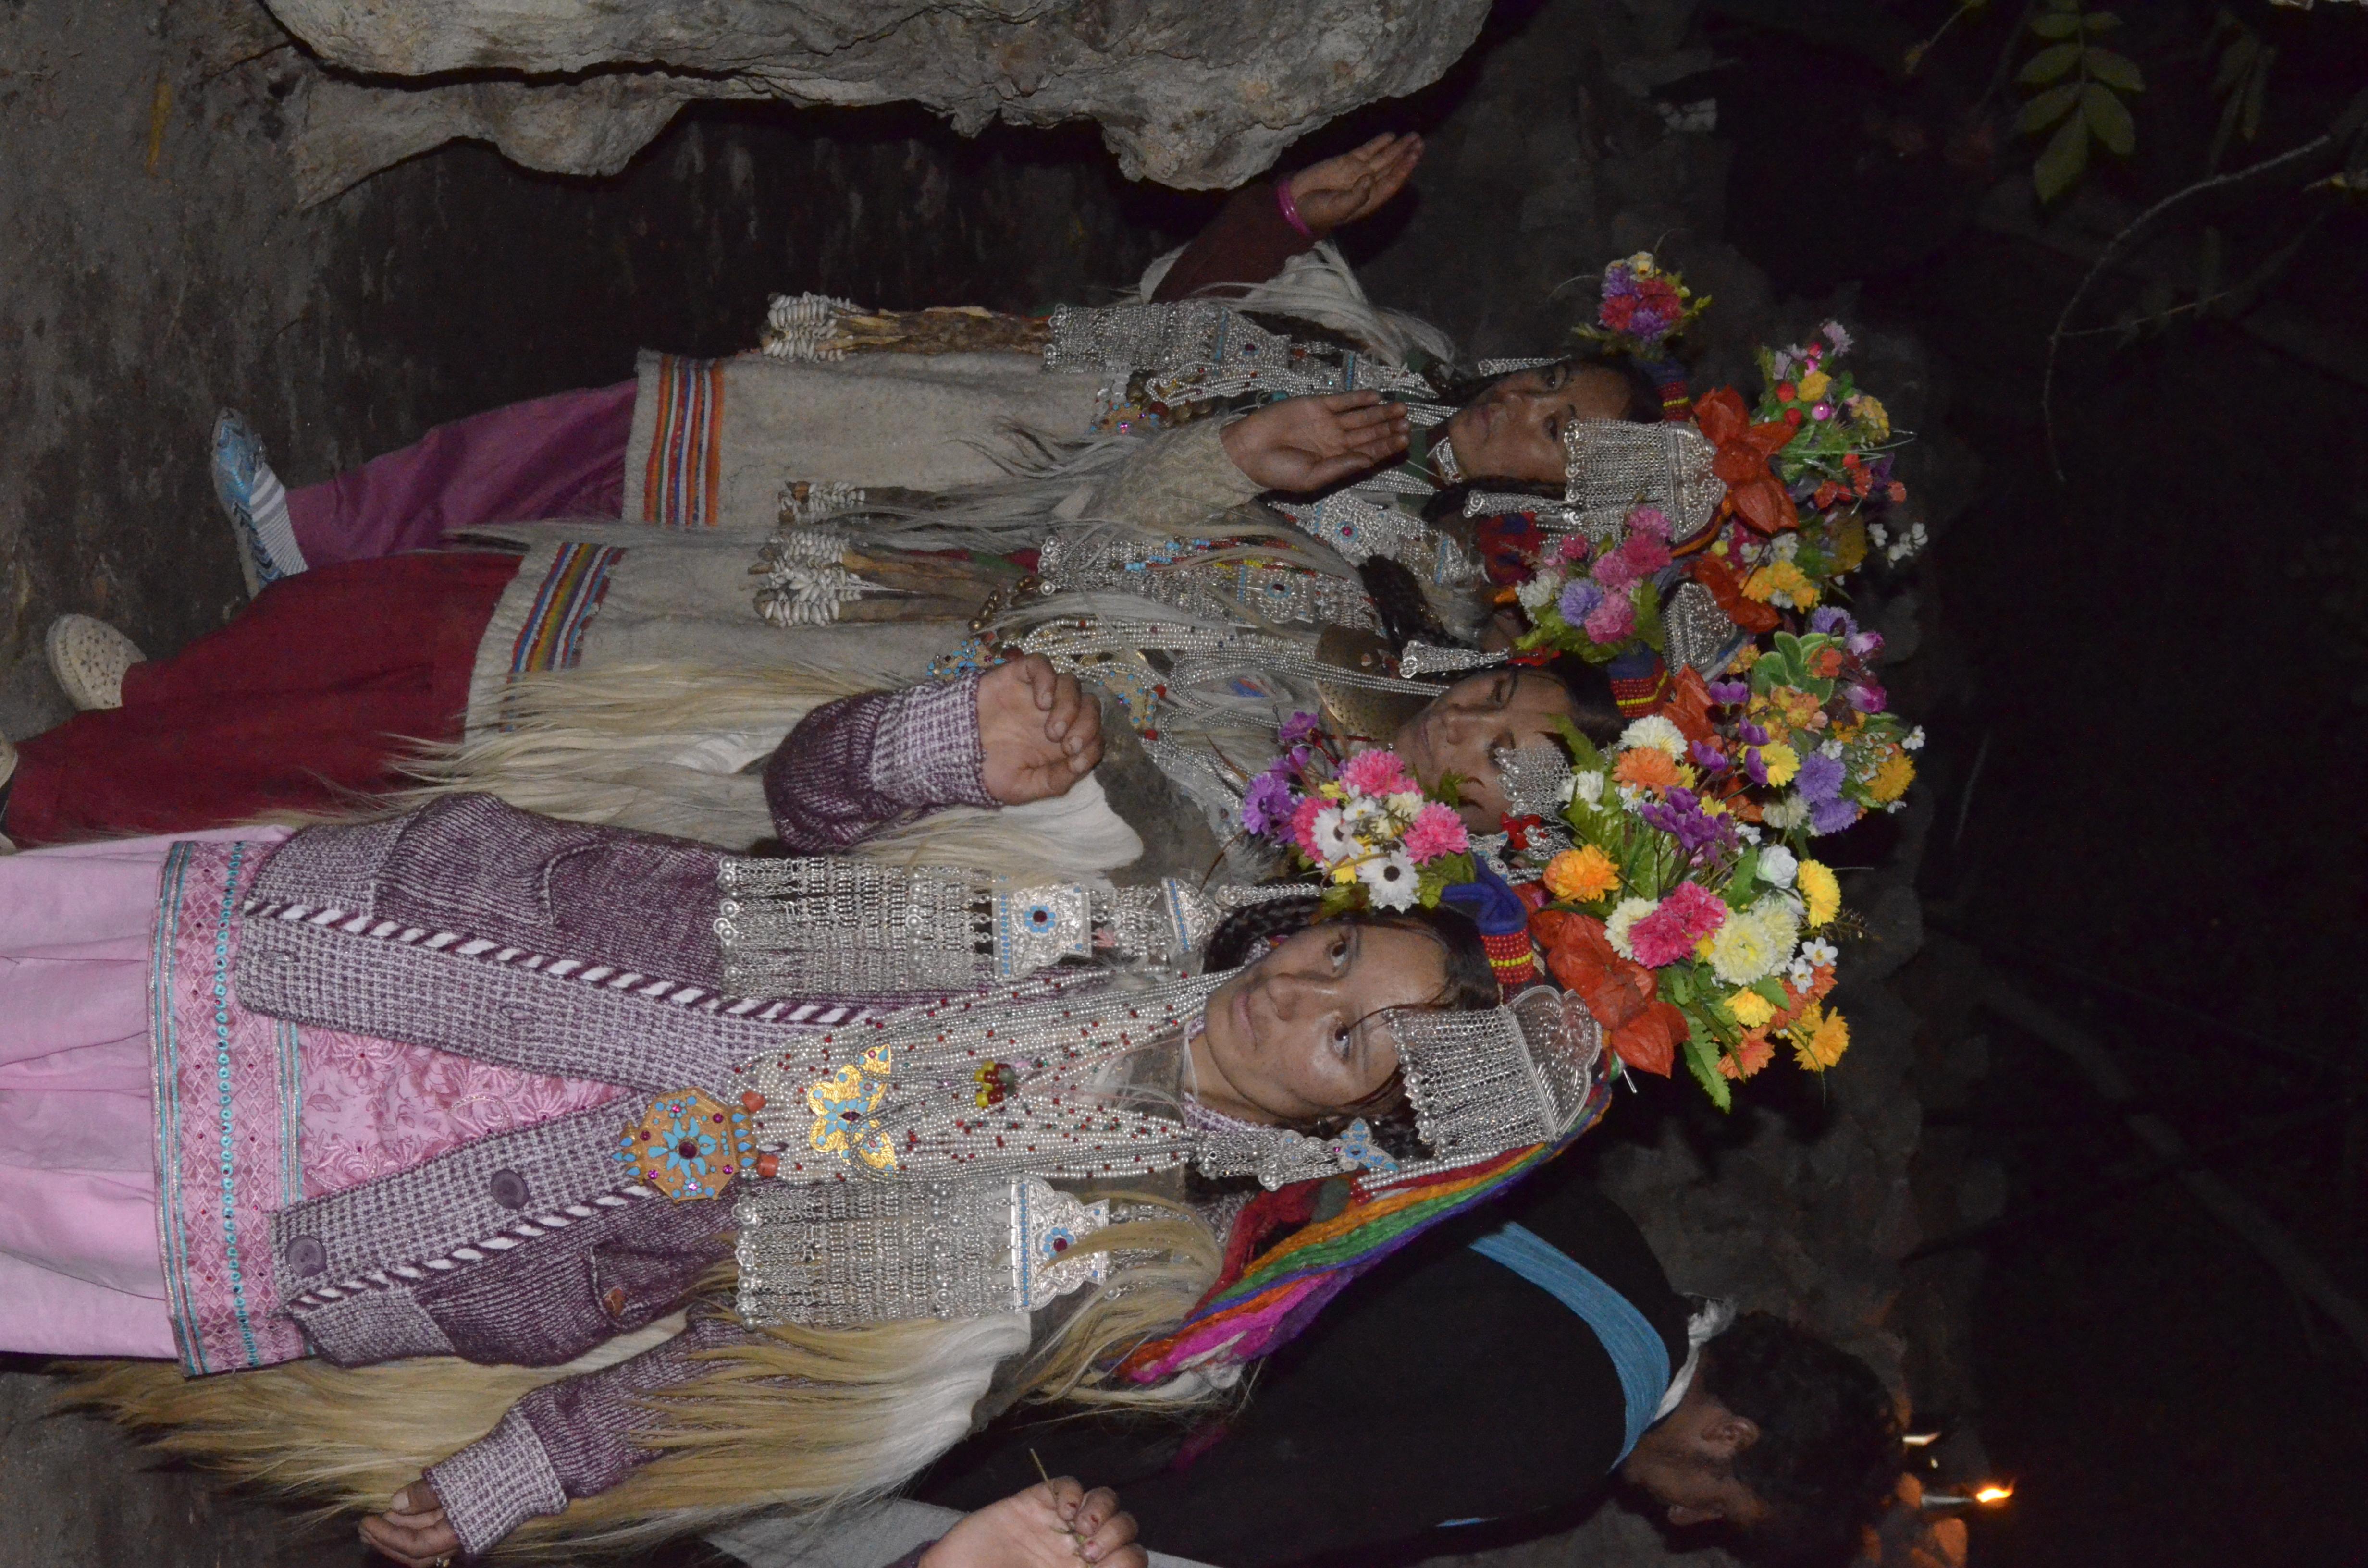 Filedancing Brokpa Women And Beautiful Flowers On The Headg